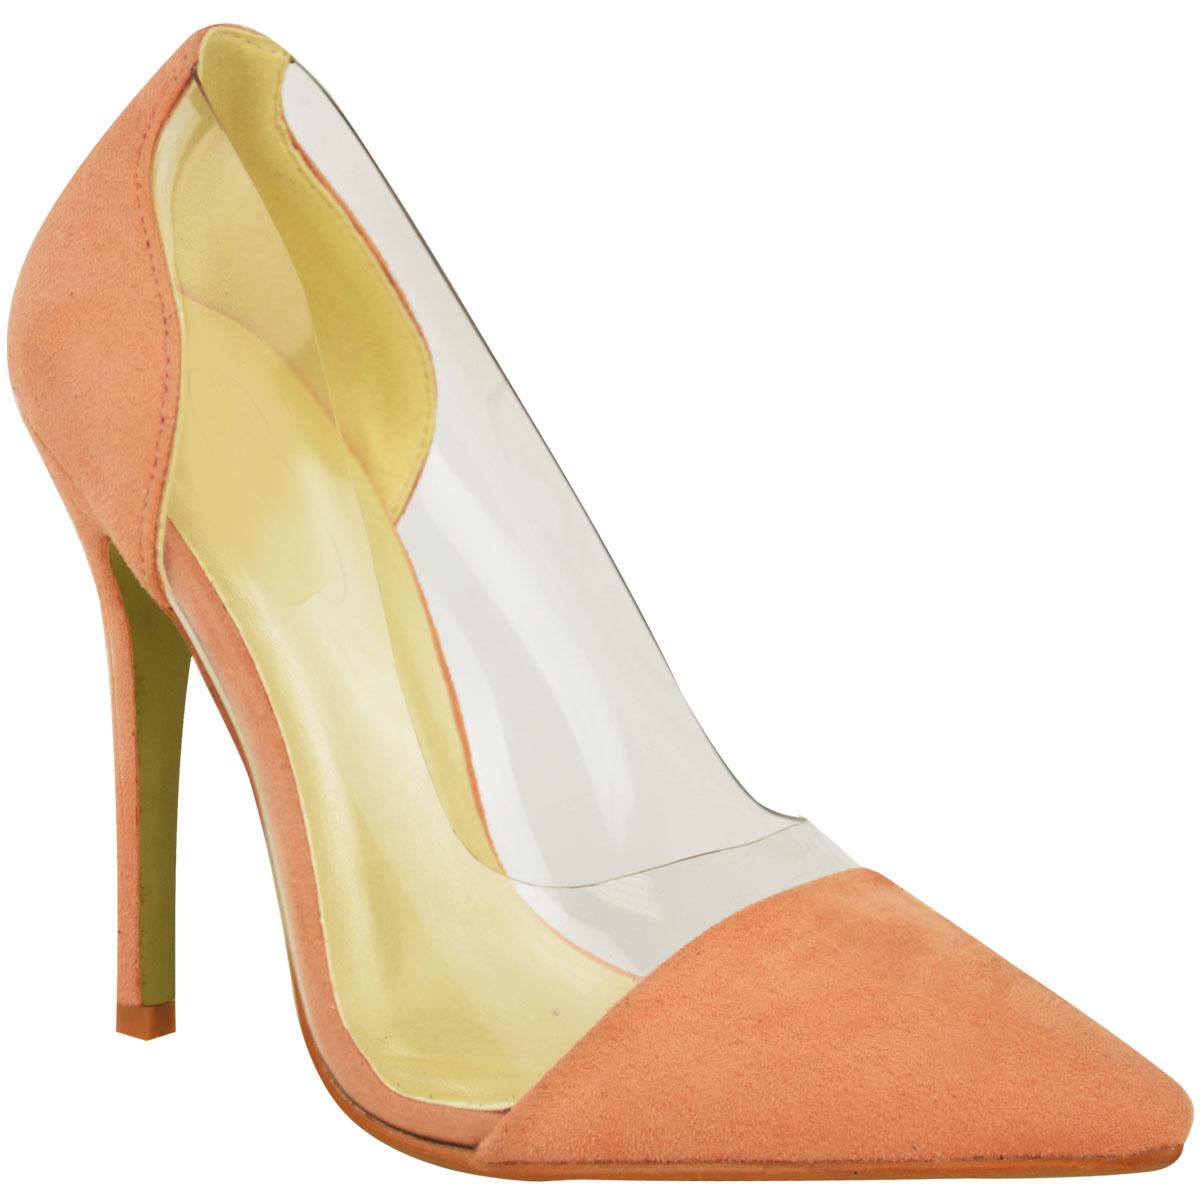 Wholesale Fashion Womens Shoes Uk